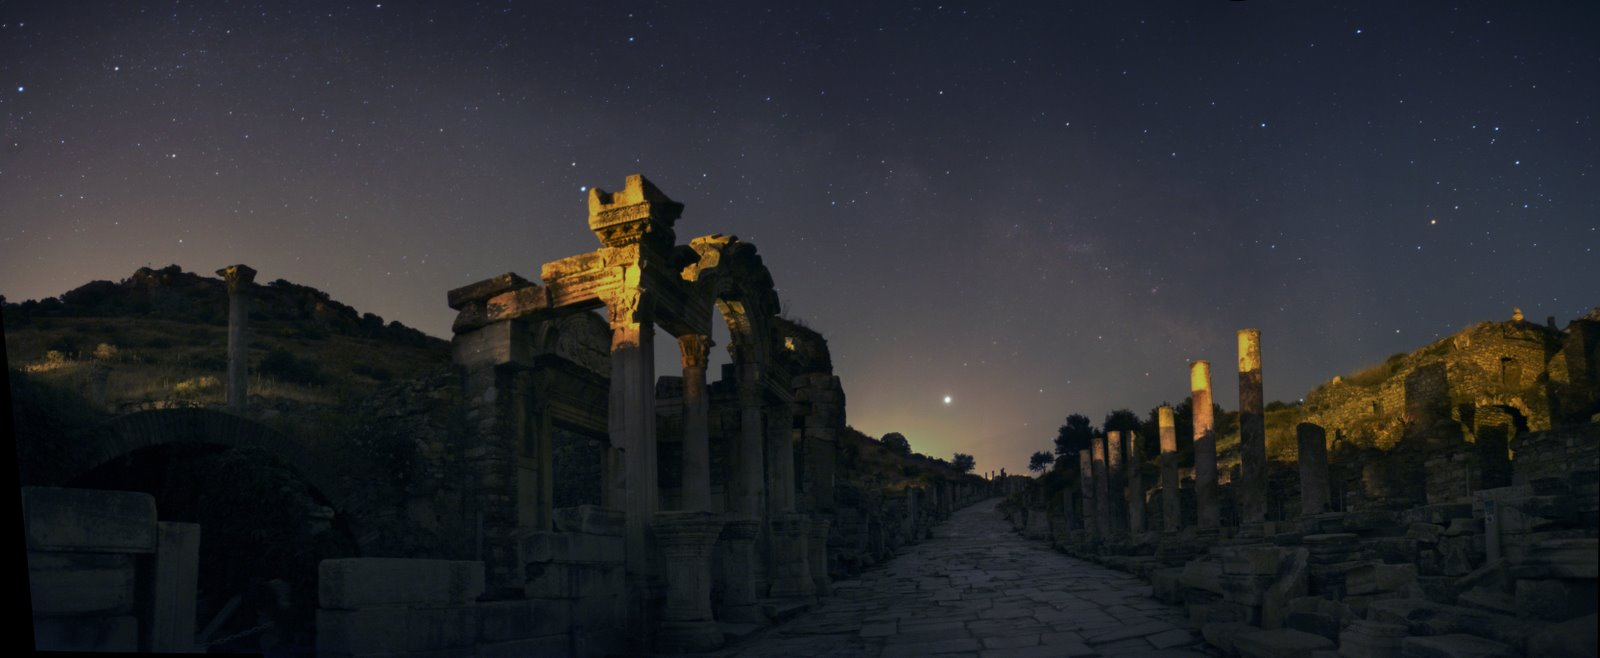 [Ephesus+at+night]